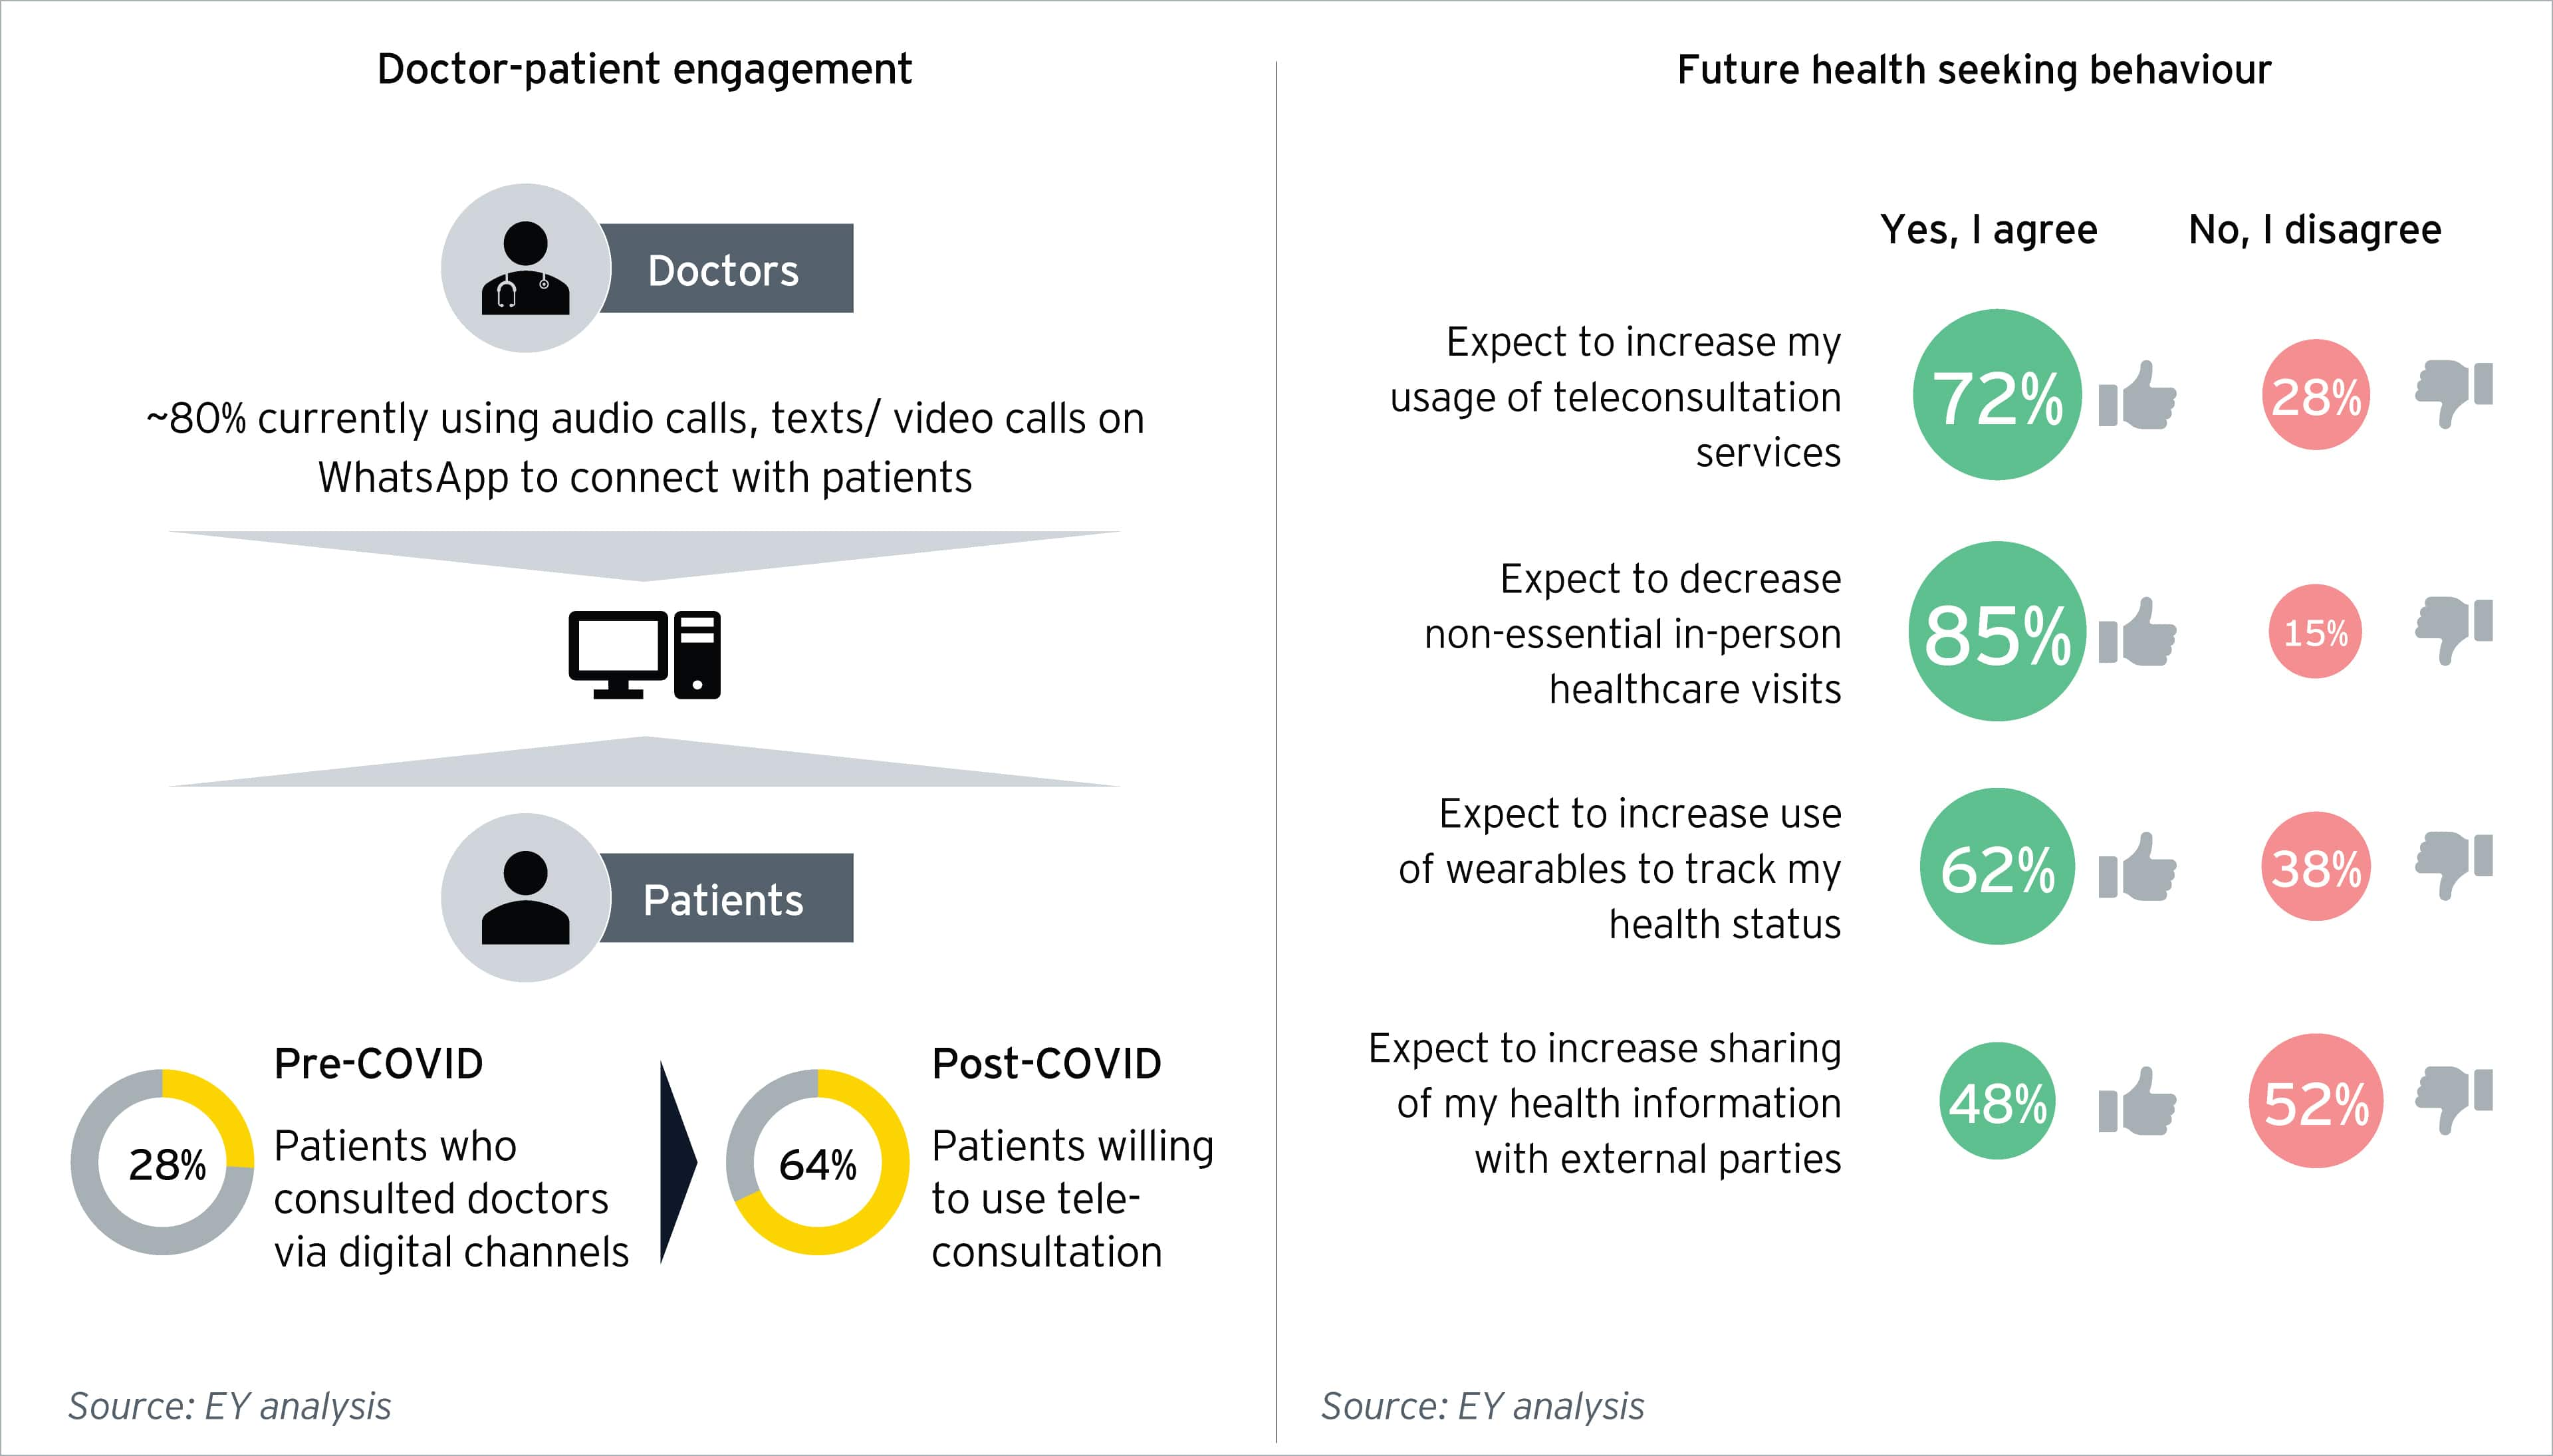 EY analysis – Future health seeking behaviour